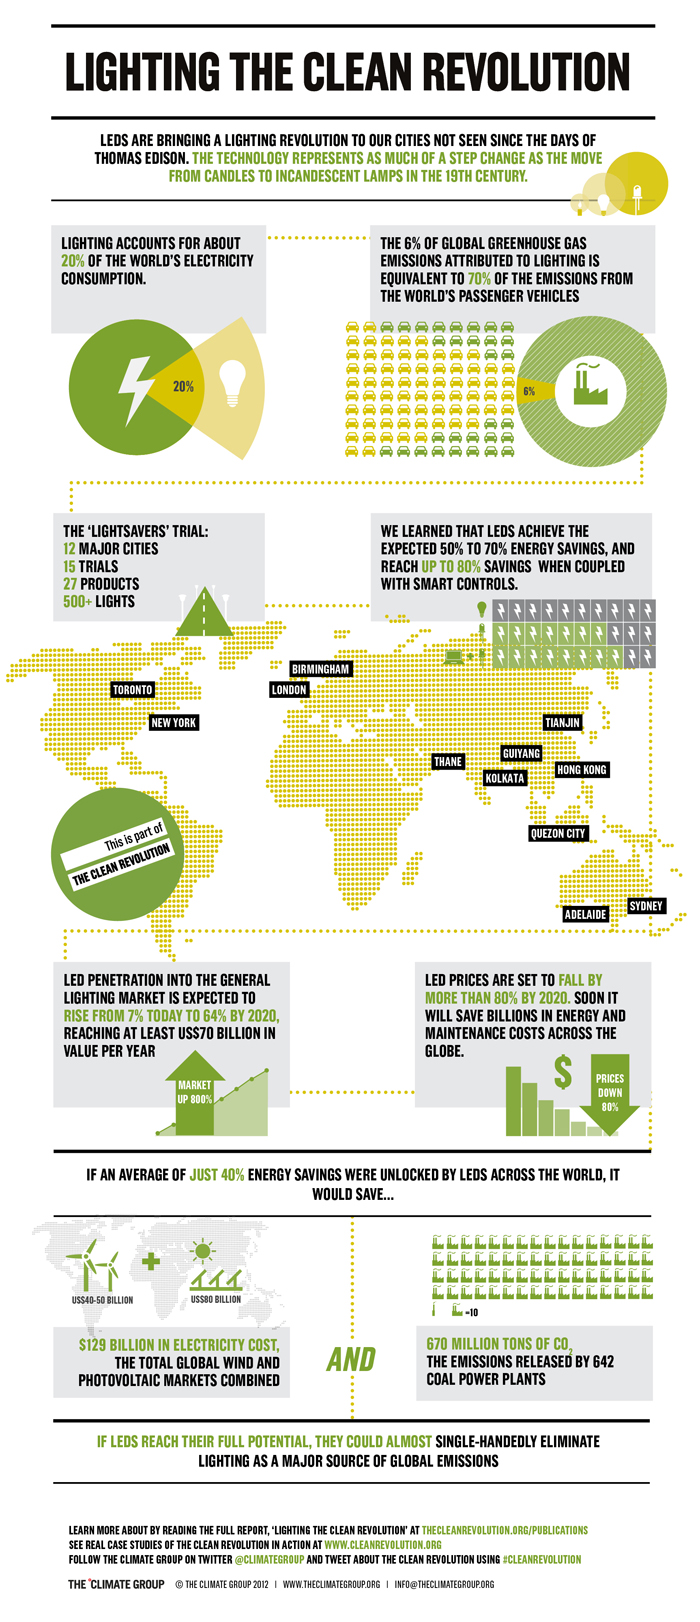 LEDS Lighting The Clean Revolution